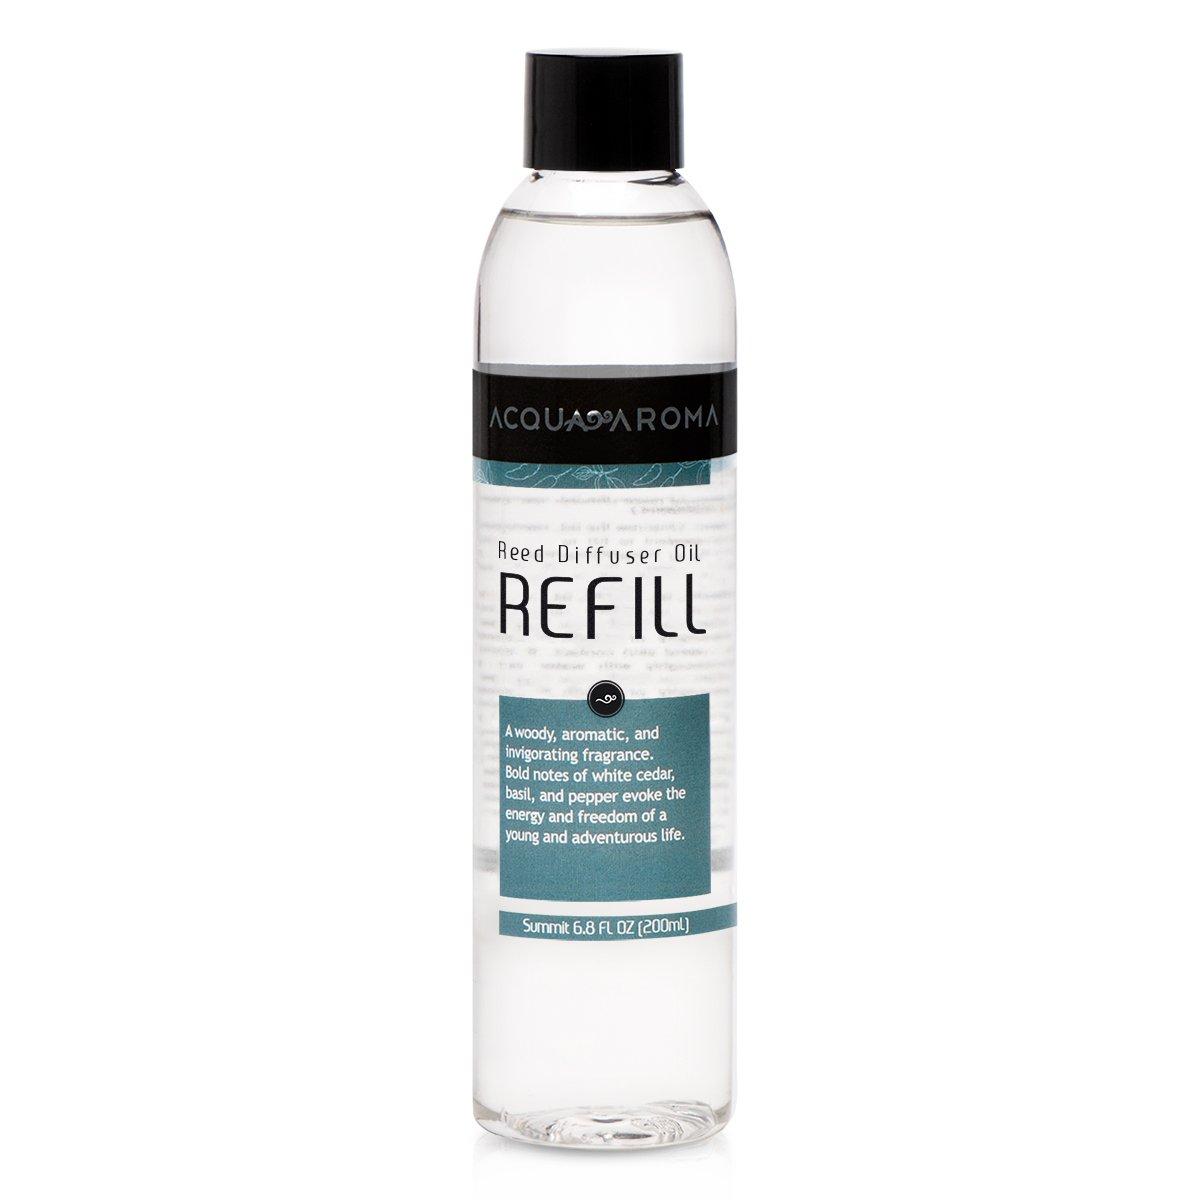 Acqua Aroma Summit (Sandal and Cedarwood) Reed Diffuser Oil Refill 6.8 FL OZ (200ml) Contains Essencial Oils